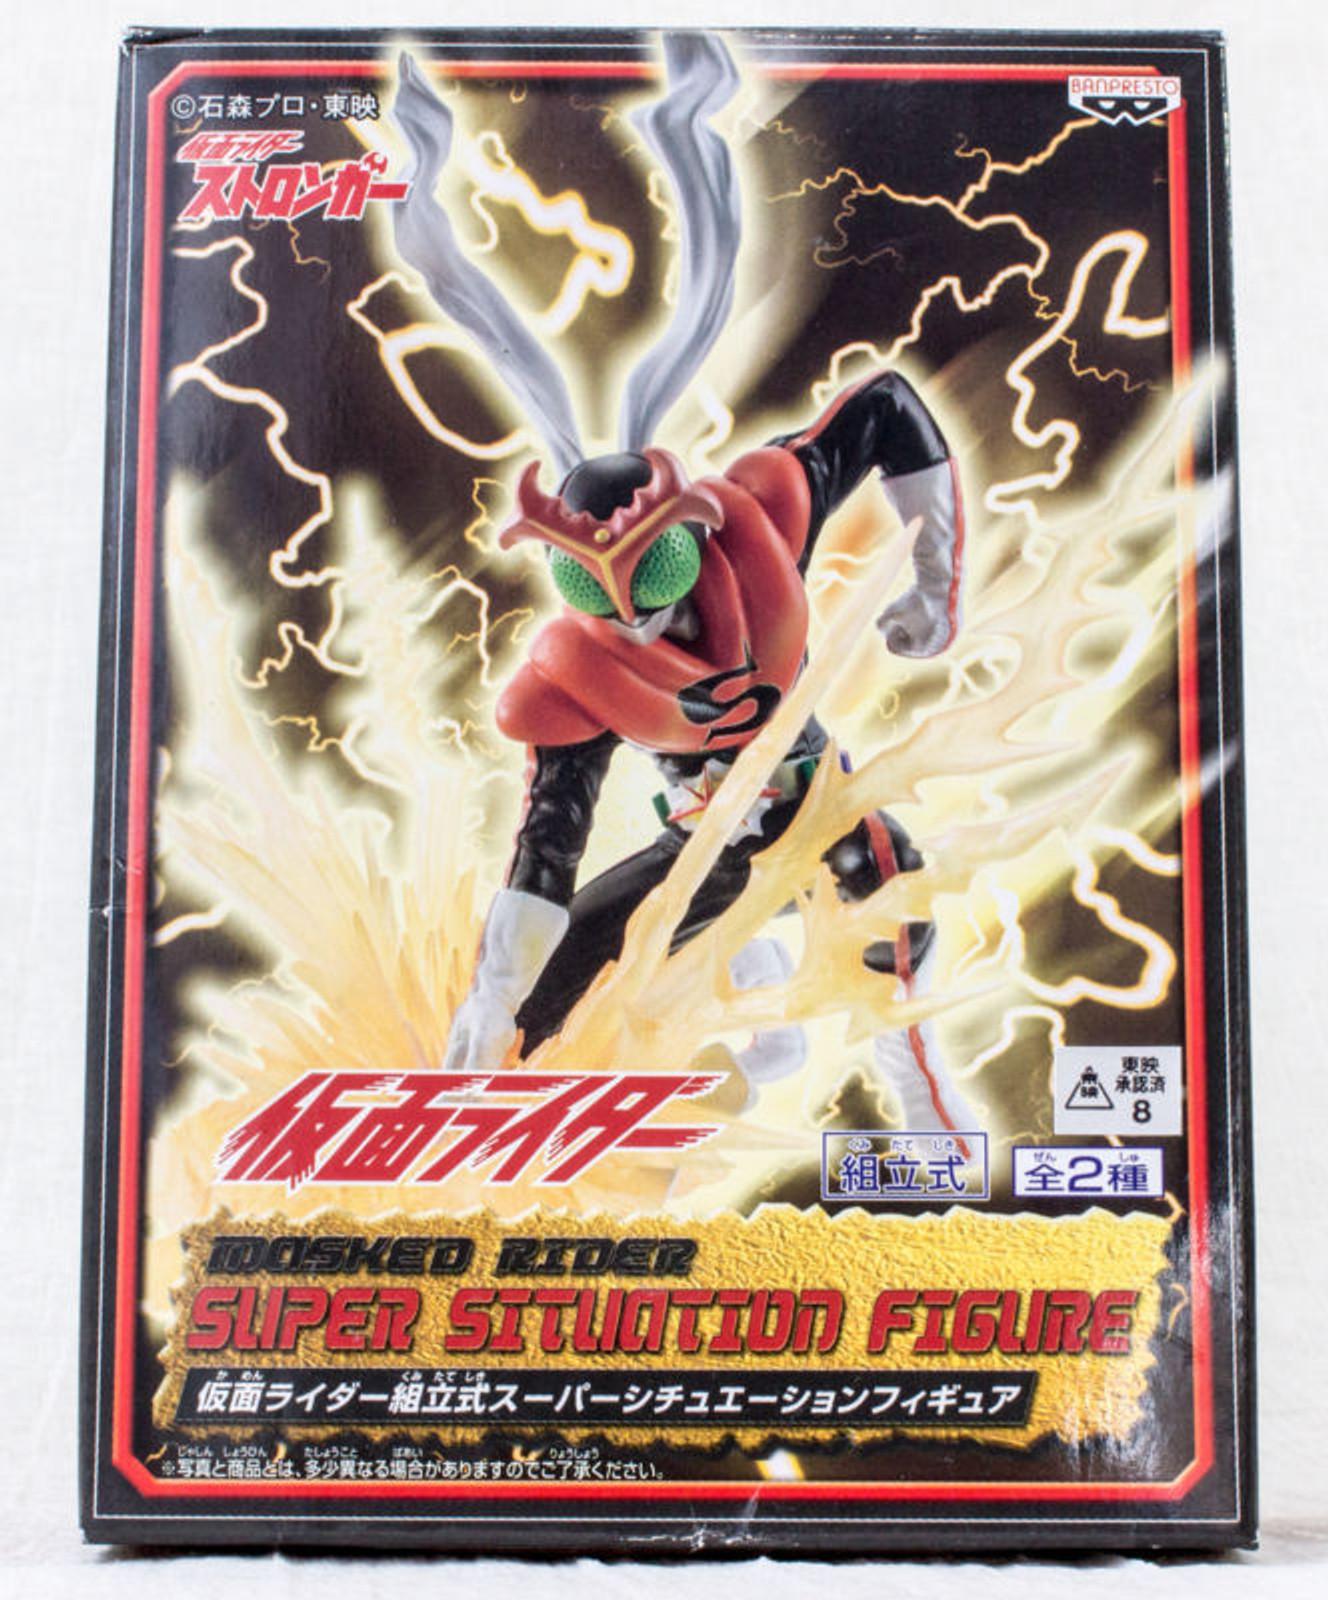 Kamen Rider Stronger Super Situation Figure Banpresto JAPAN